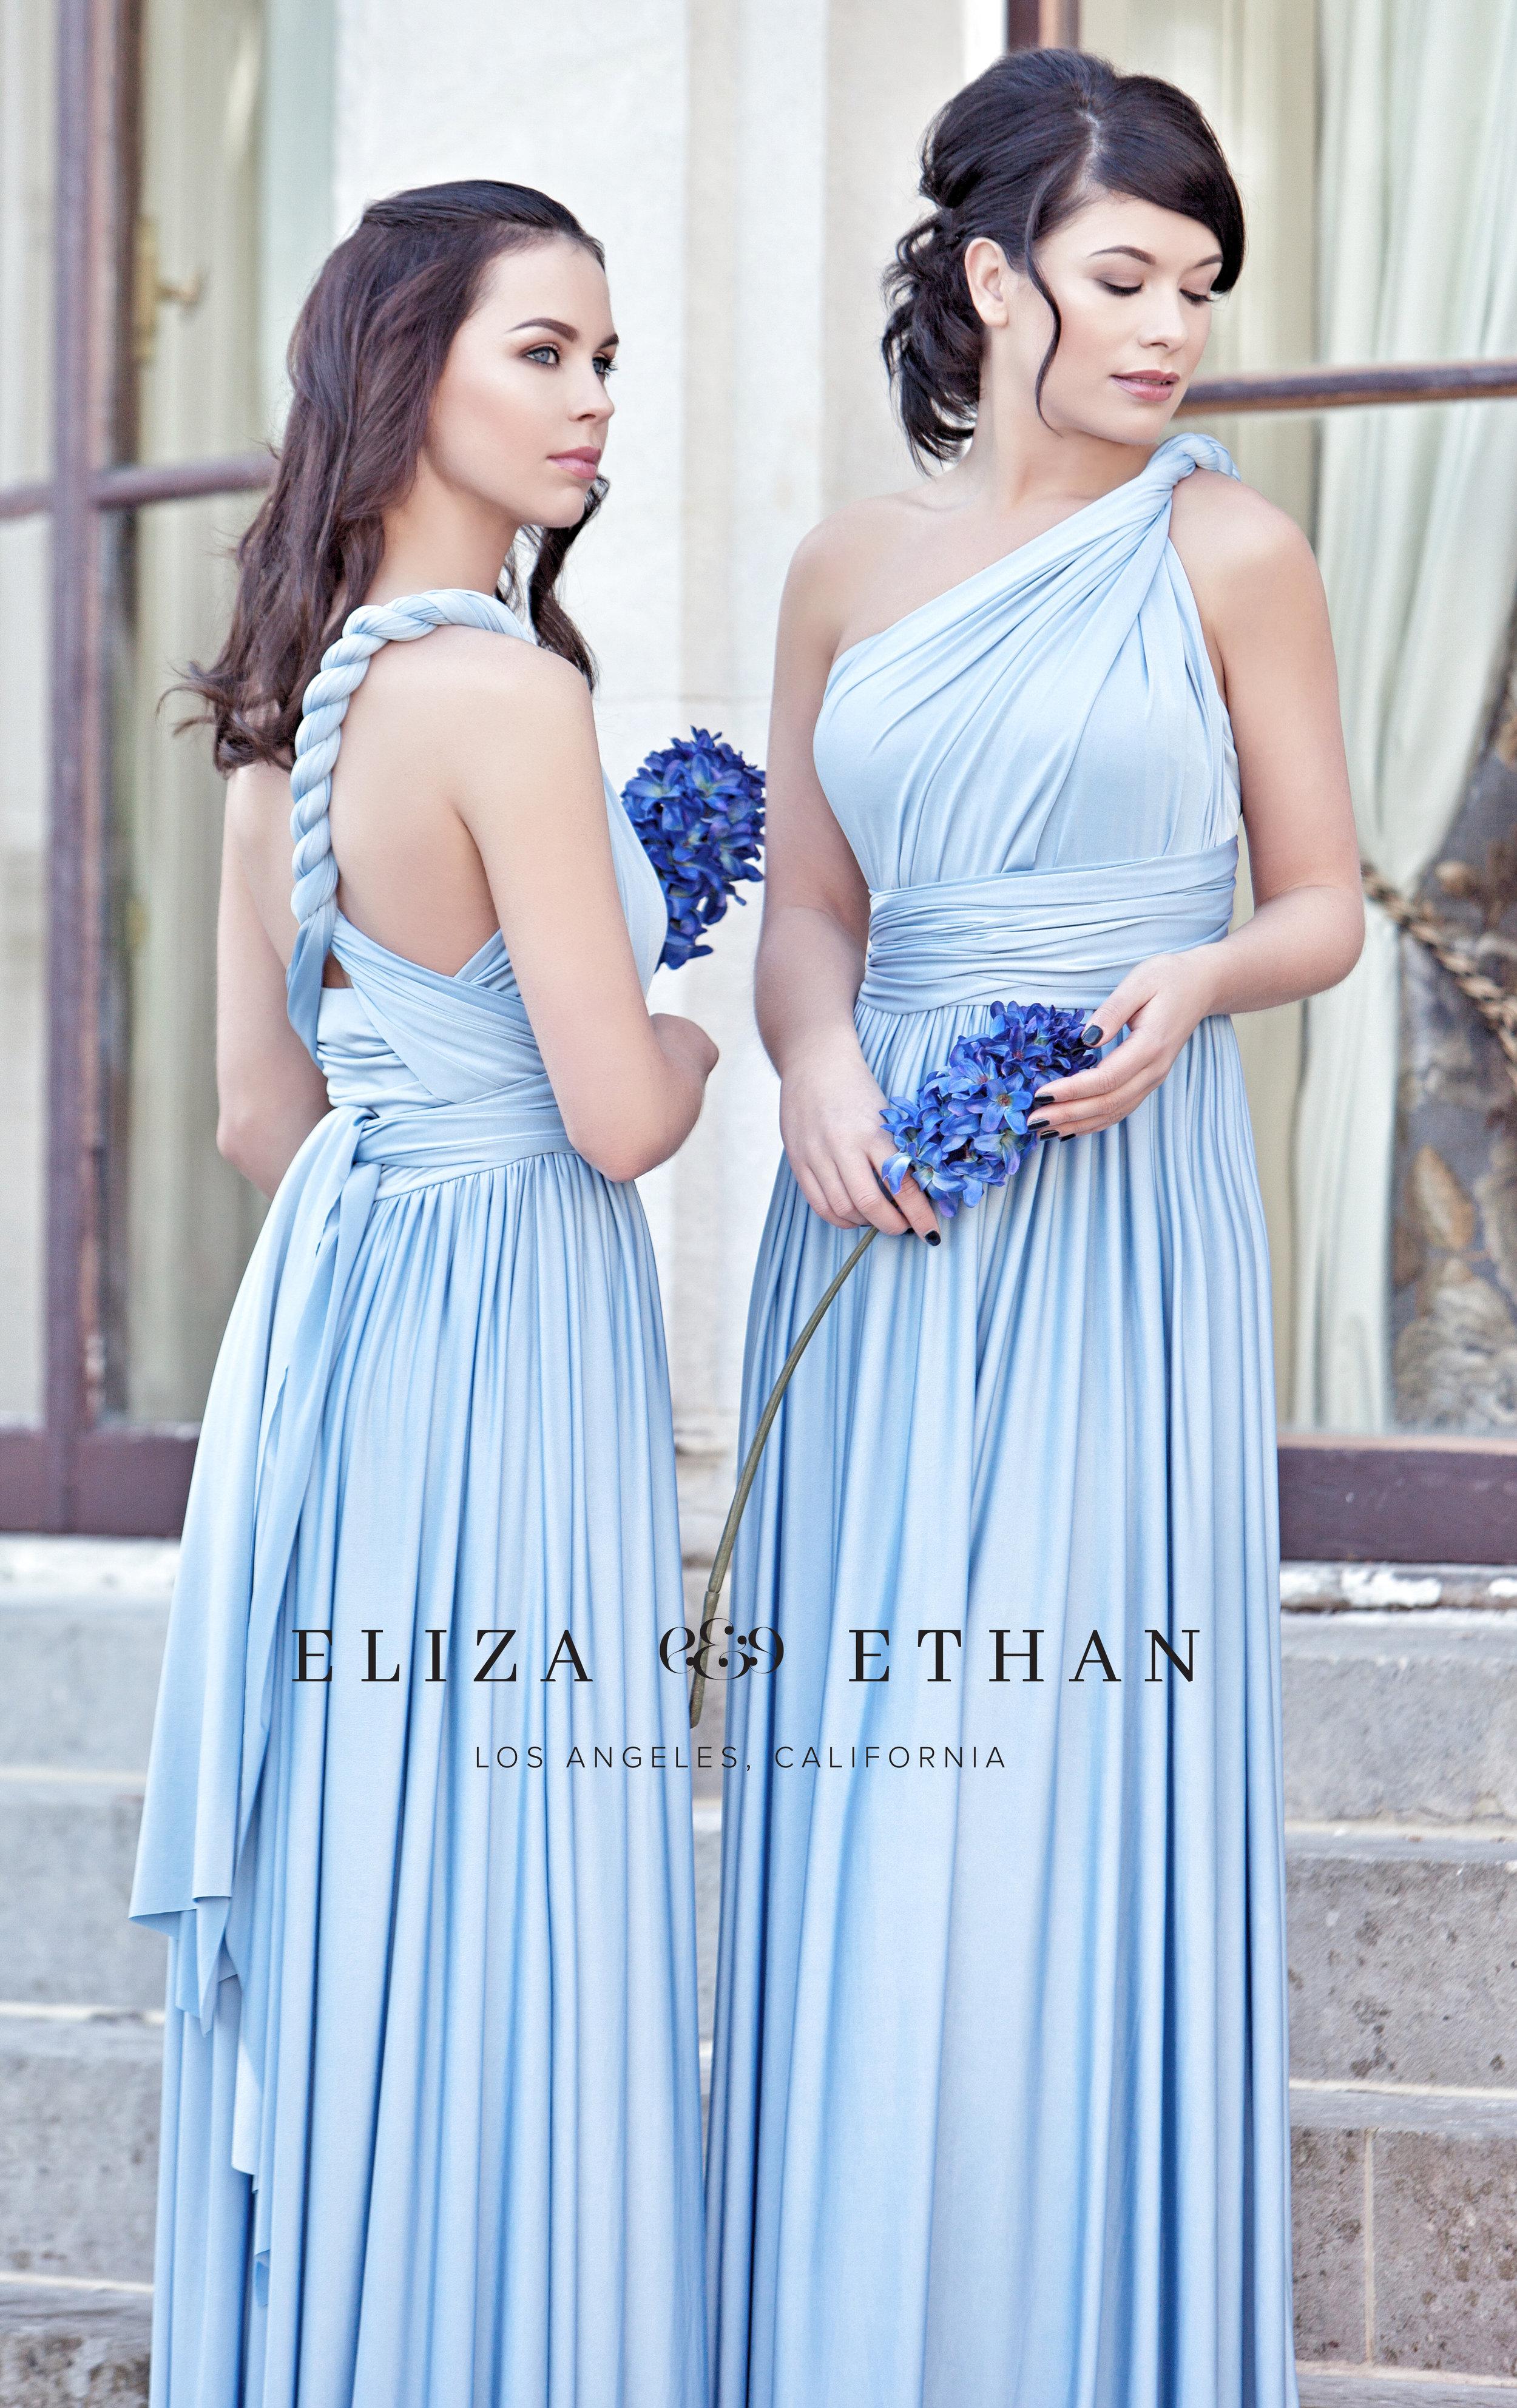 Eliza & Ethan multi way wrap dress blue bridesmaids dress